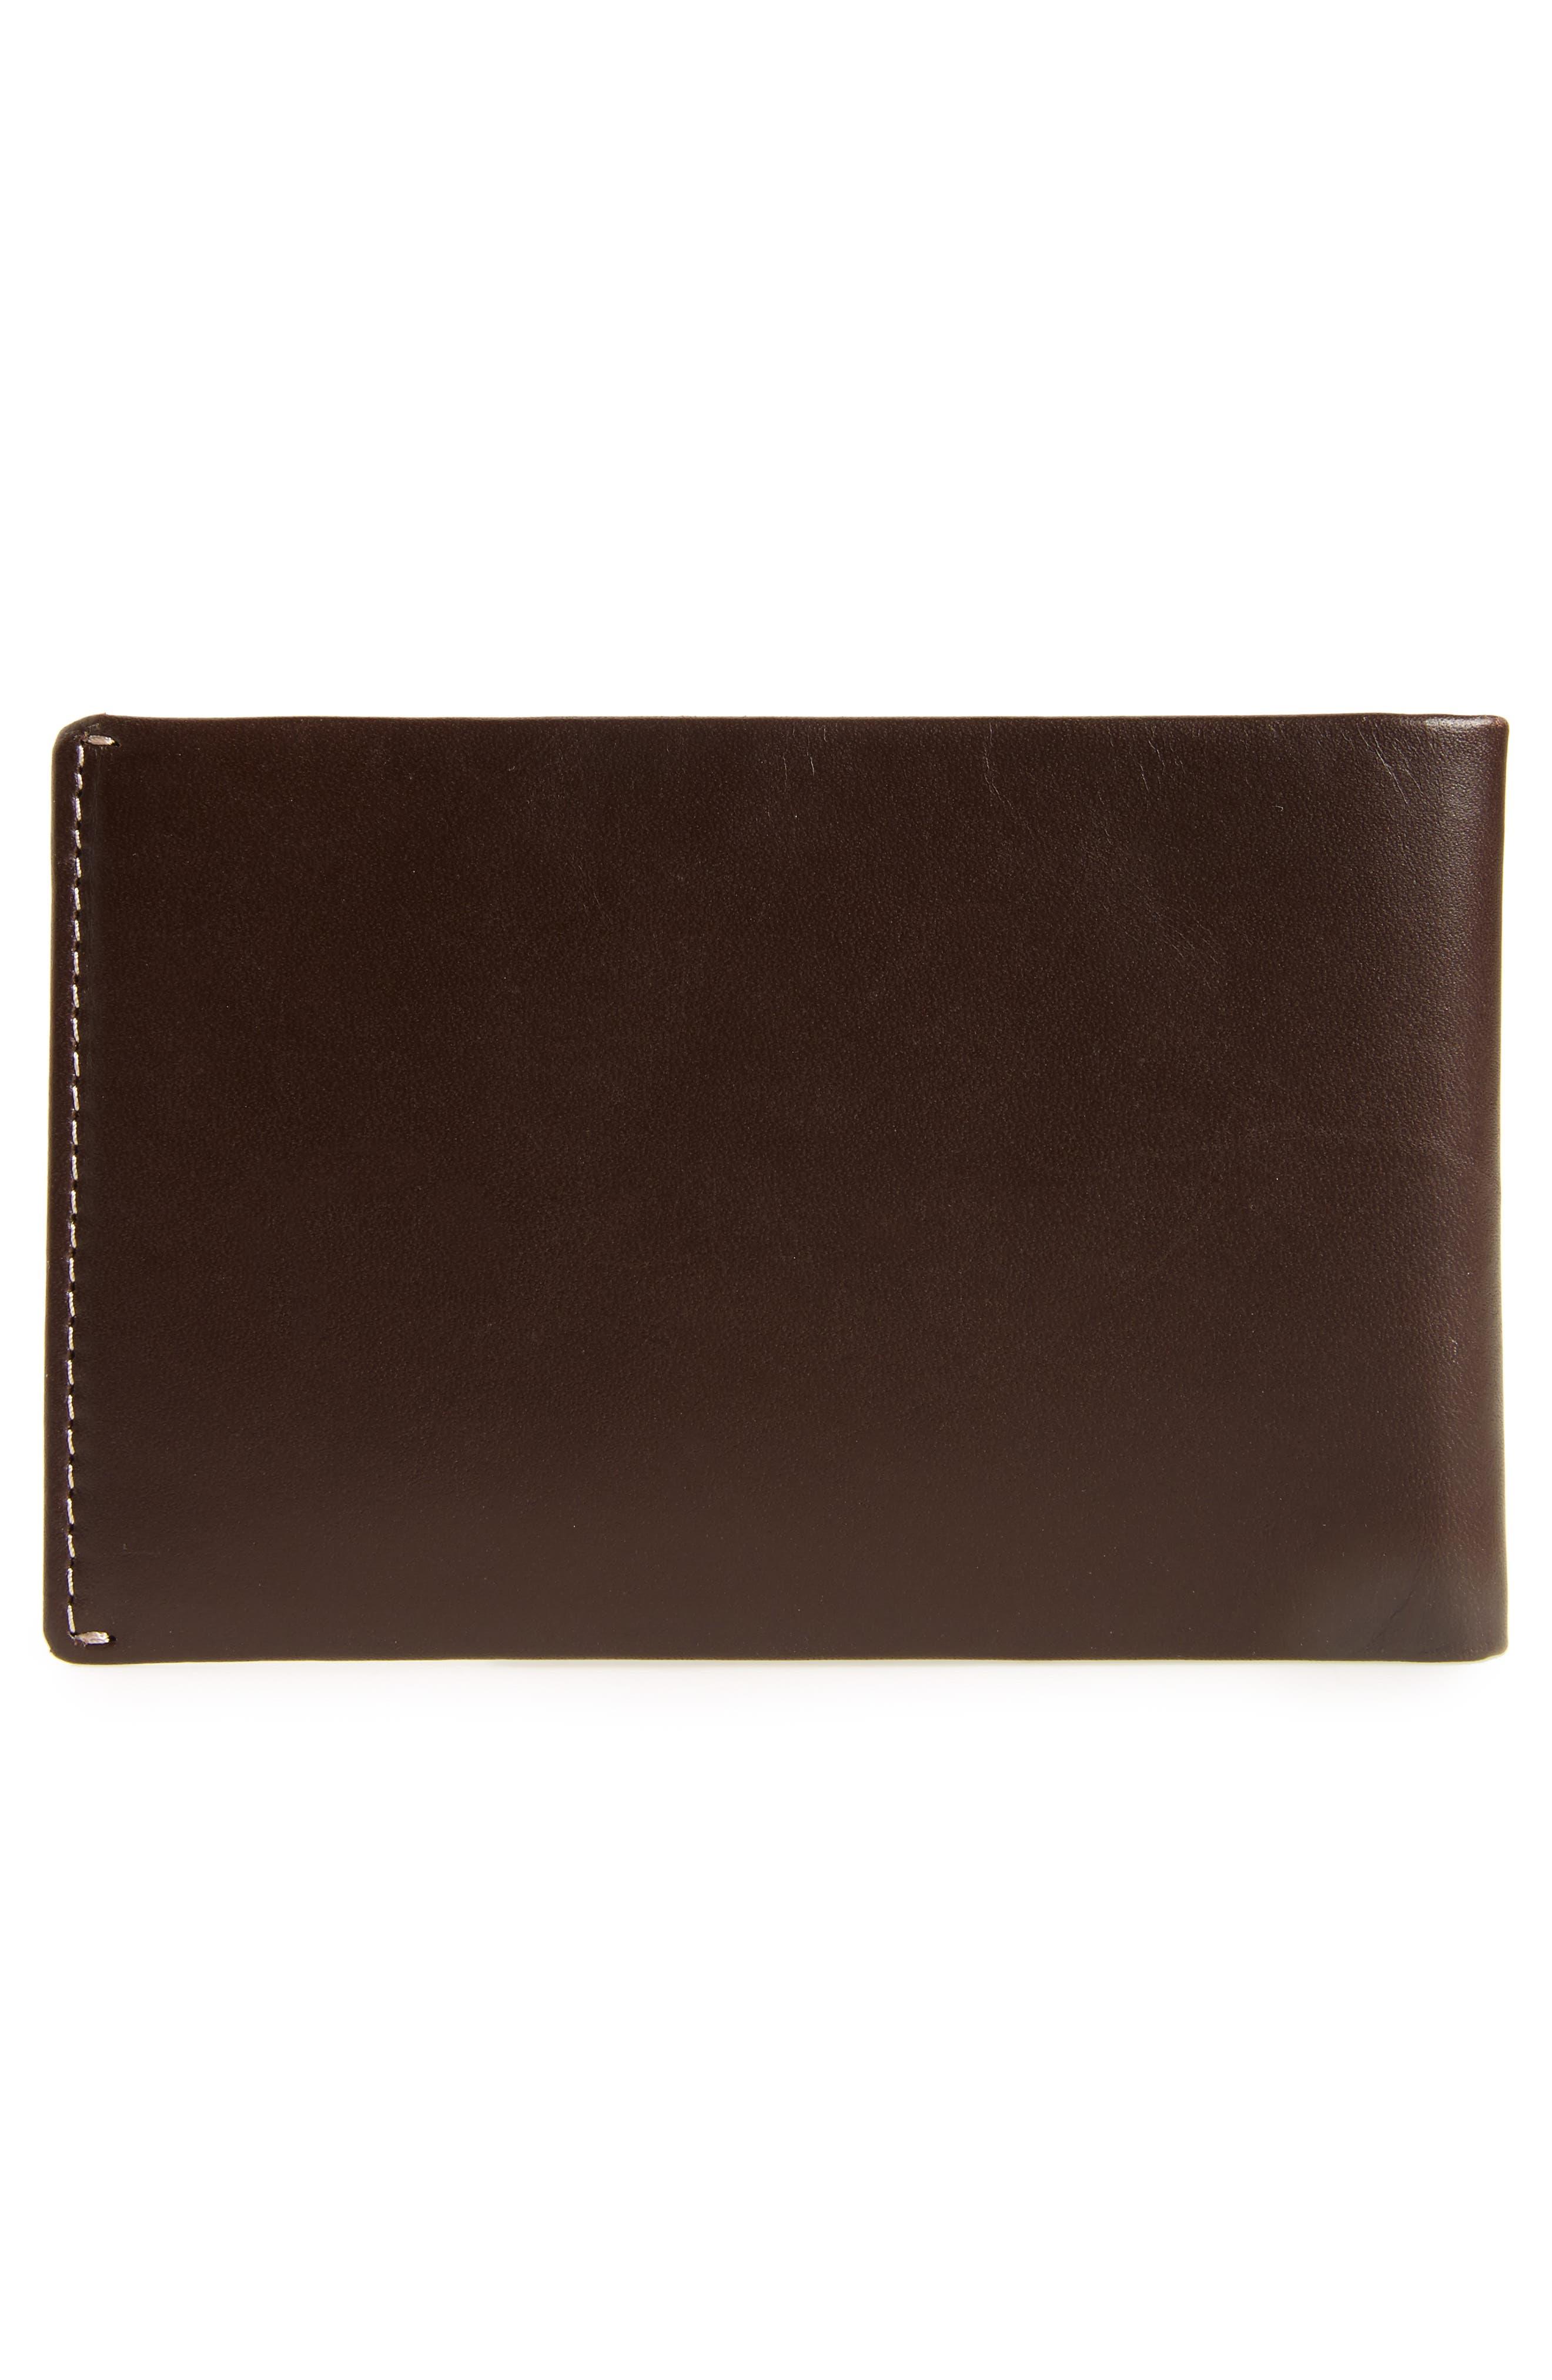 RFID Travel Wallet,                             Alternate thumbnail 3, color,                             Java